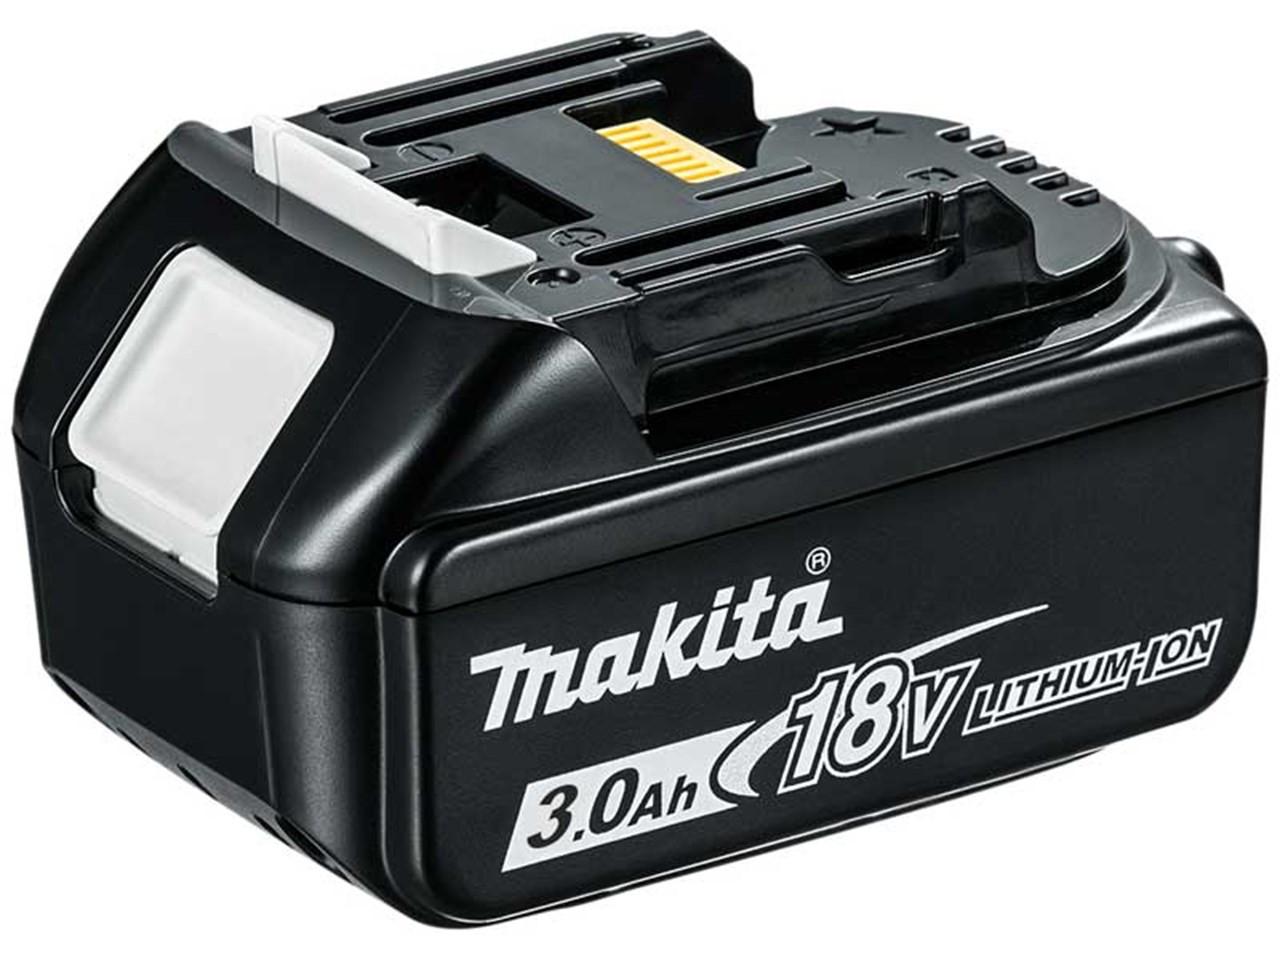 Makita 18V Li-ion Battery 3.0Ah (BL 1830)